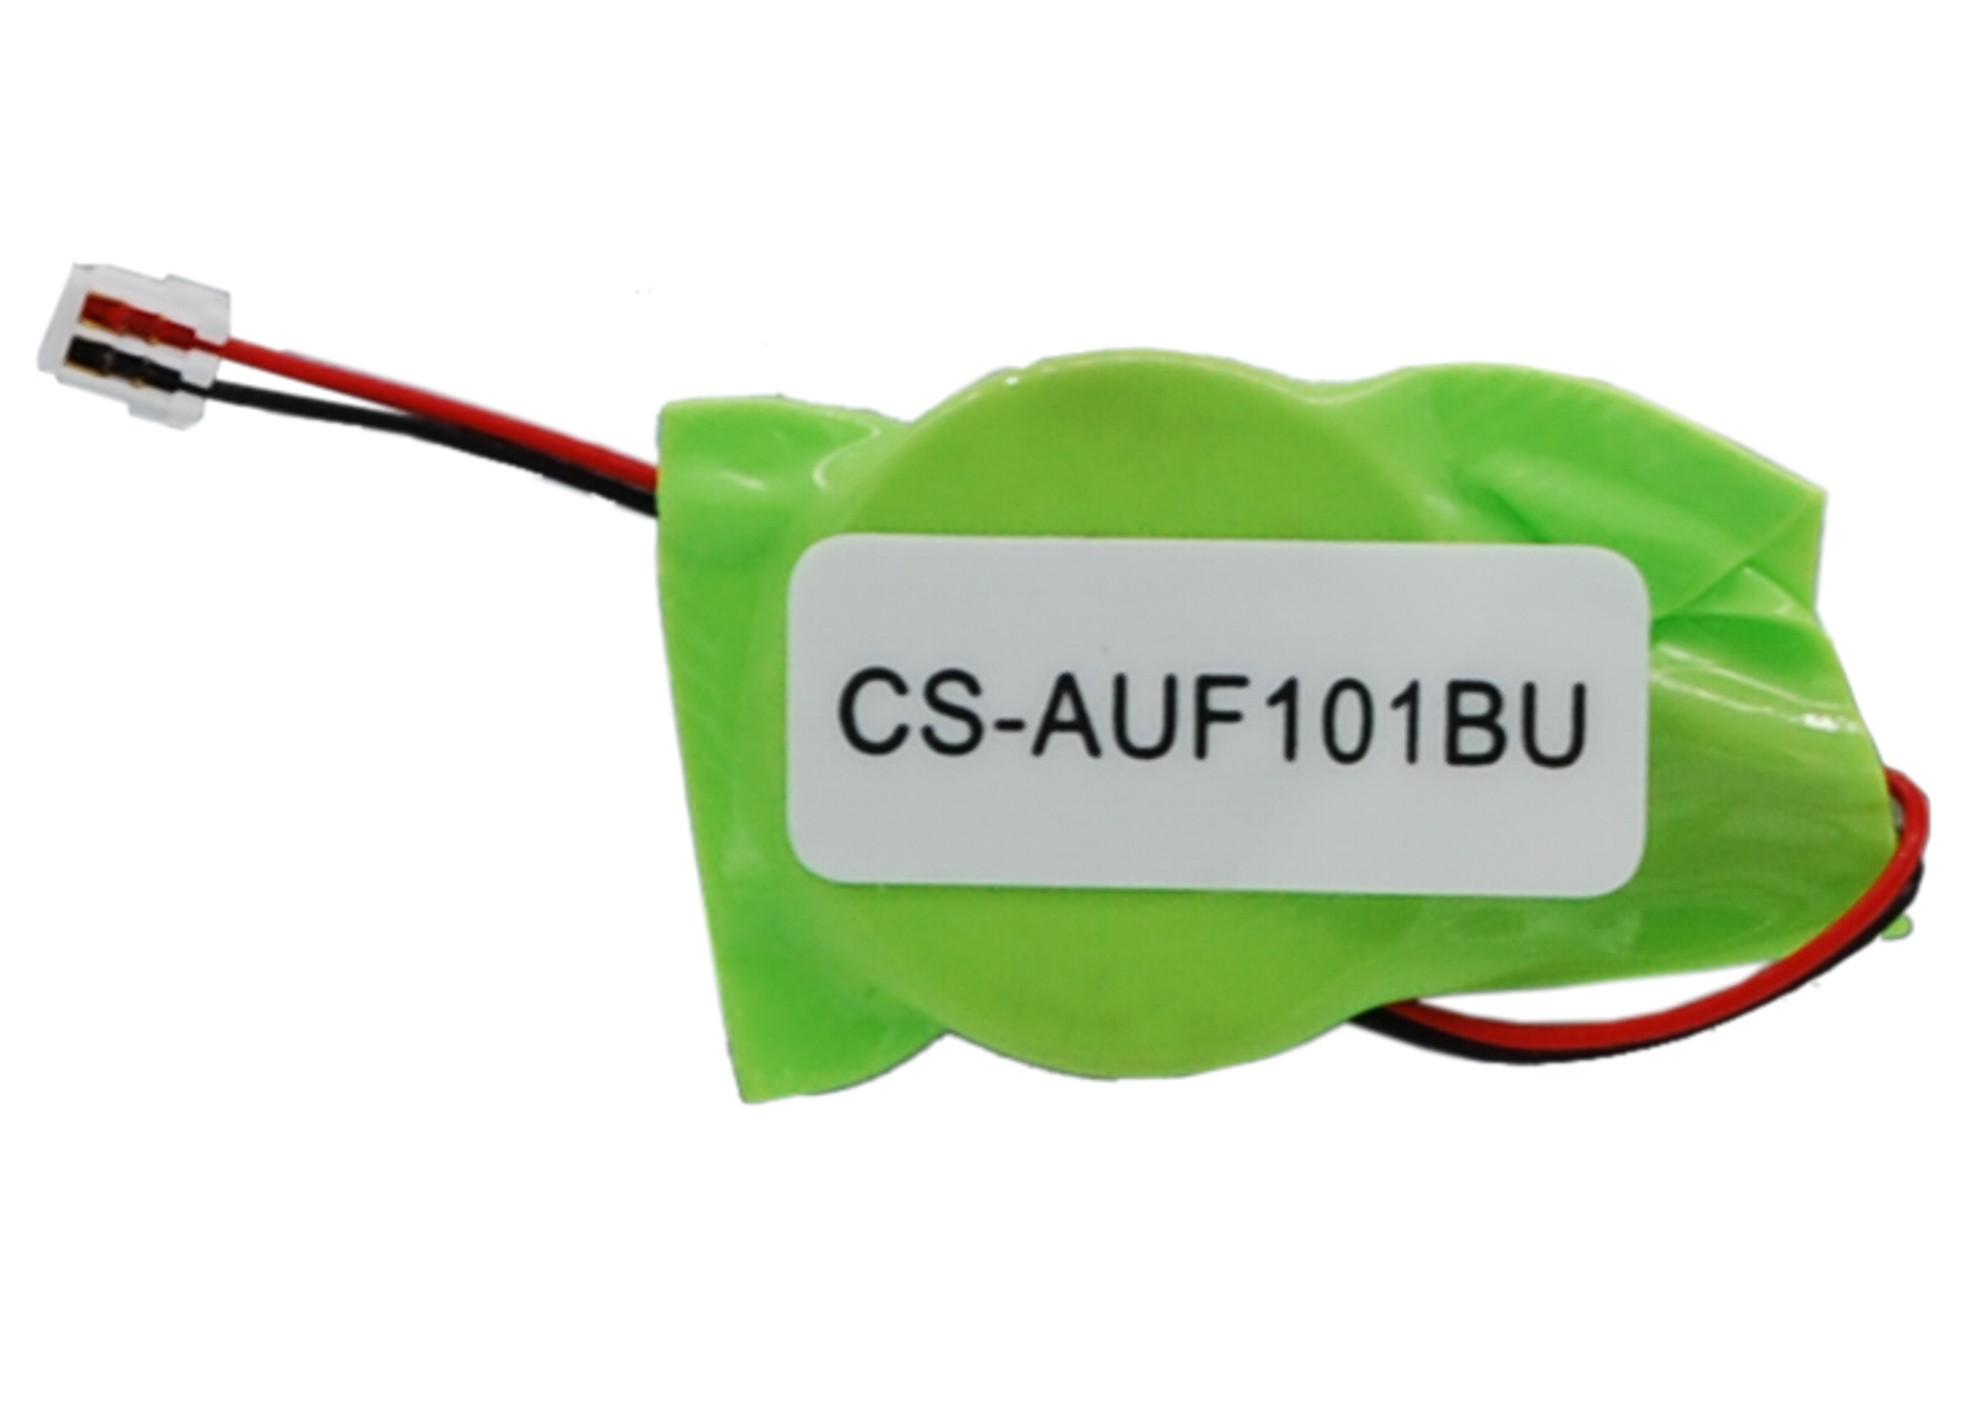 Cameron Sino baterie cmos pro ASUS Eee Pad Transformer TF101X1 16GB 3V Li-ion 40mAh zelená - neoriginální